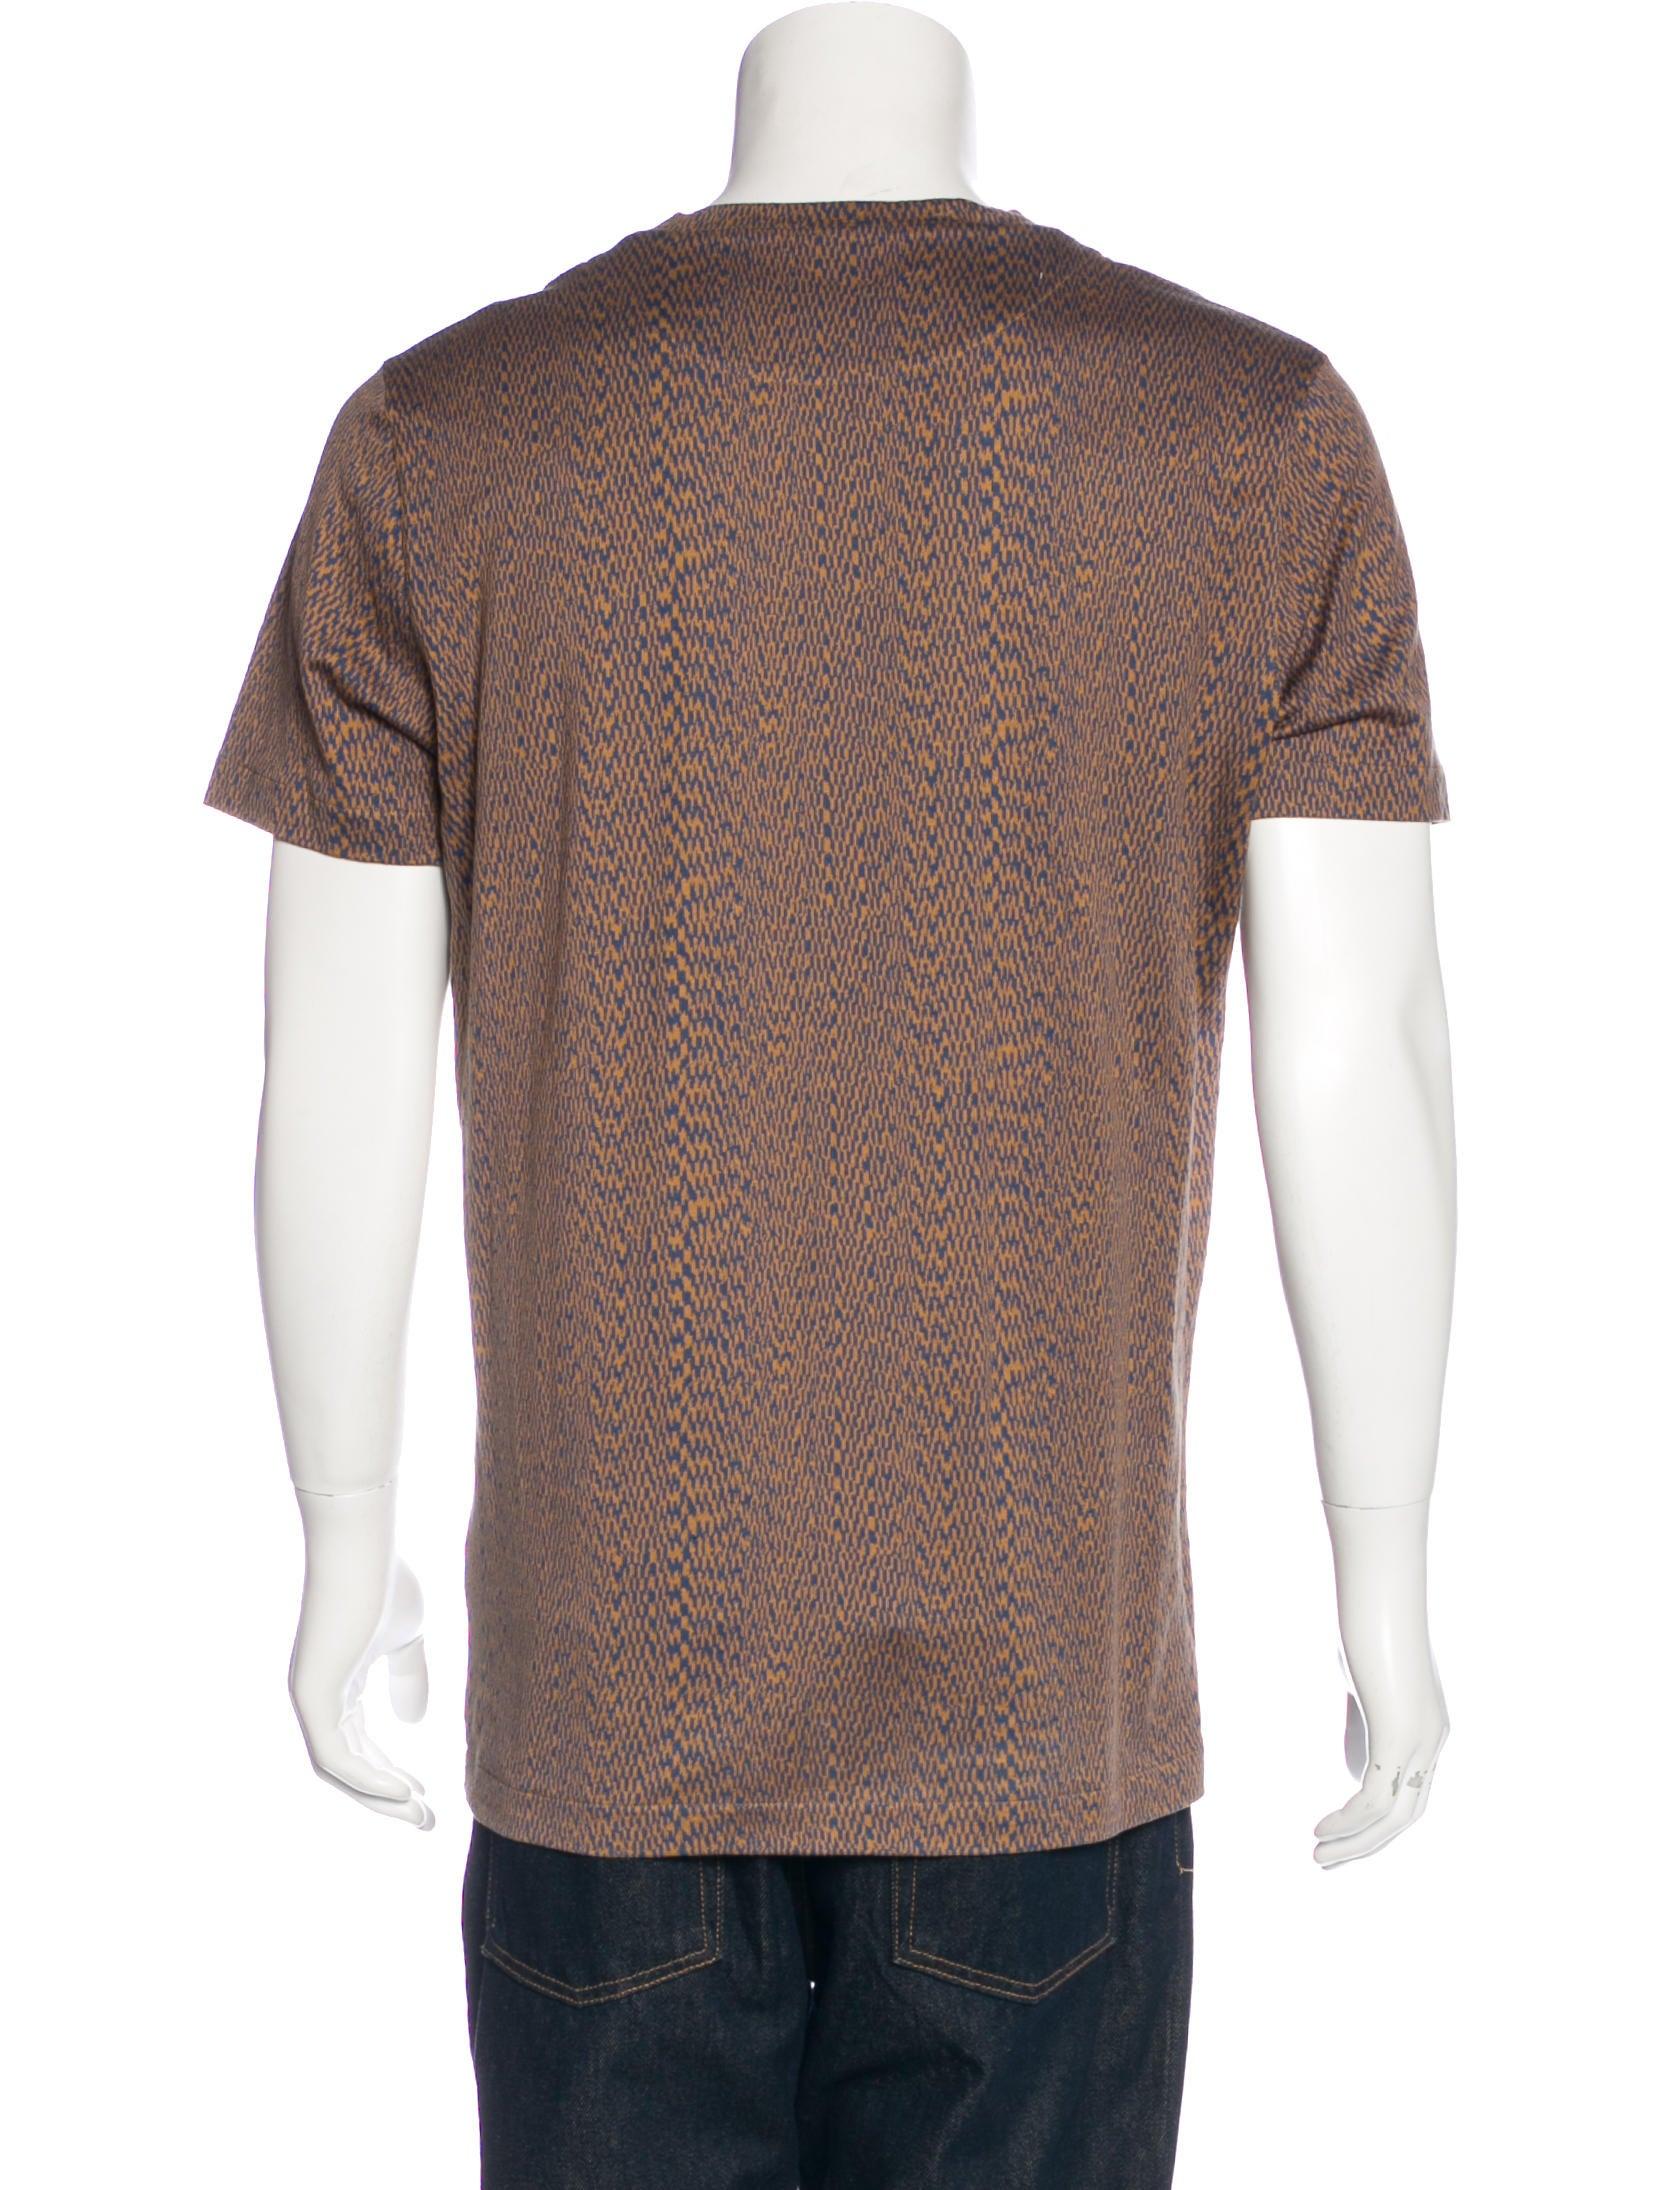 louis vuitton america 39 s cup t shirt clothing lou126671